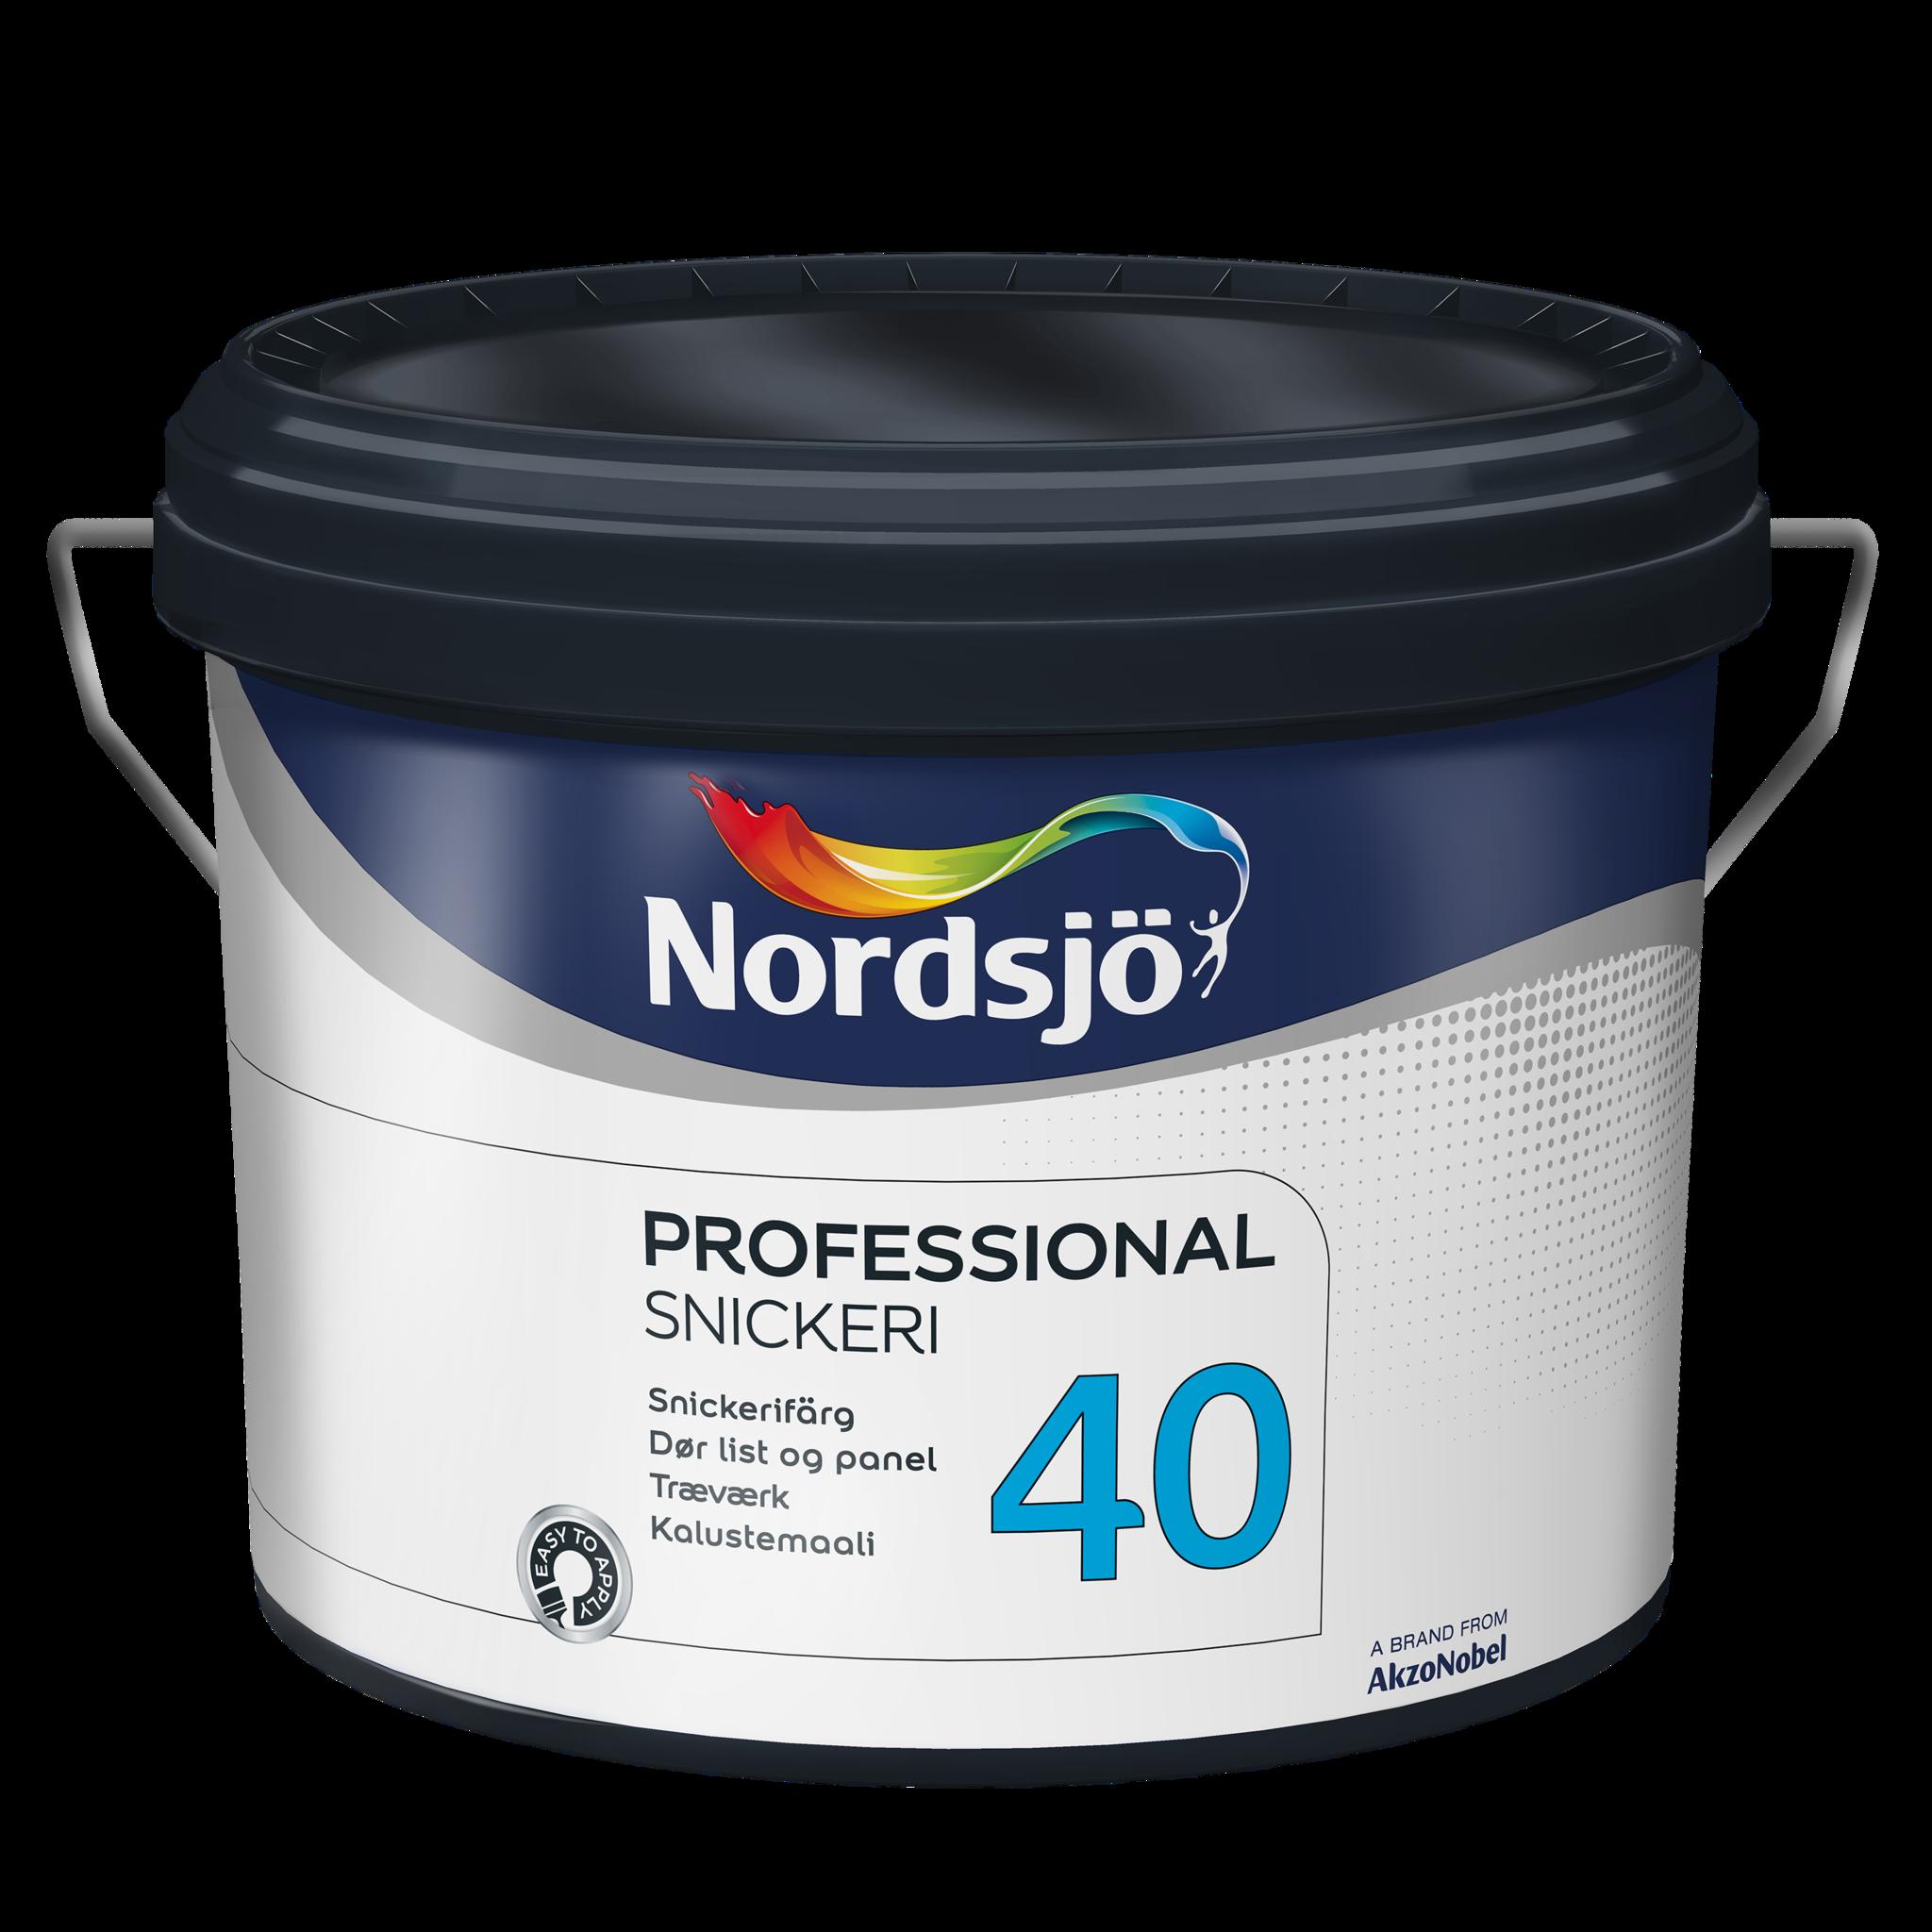 Nordsjö Professional Snickeri 40